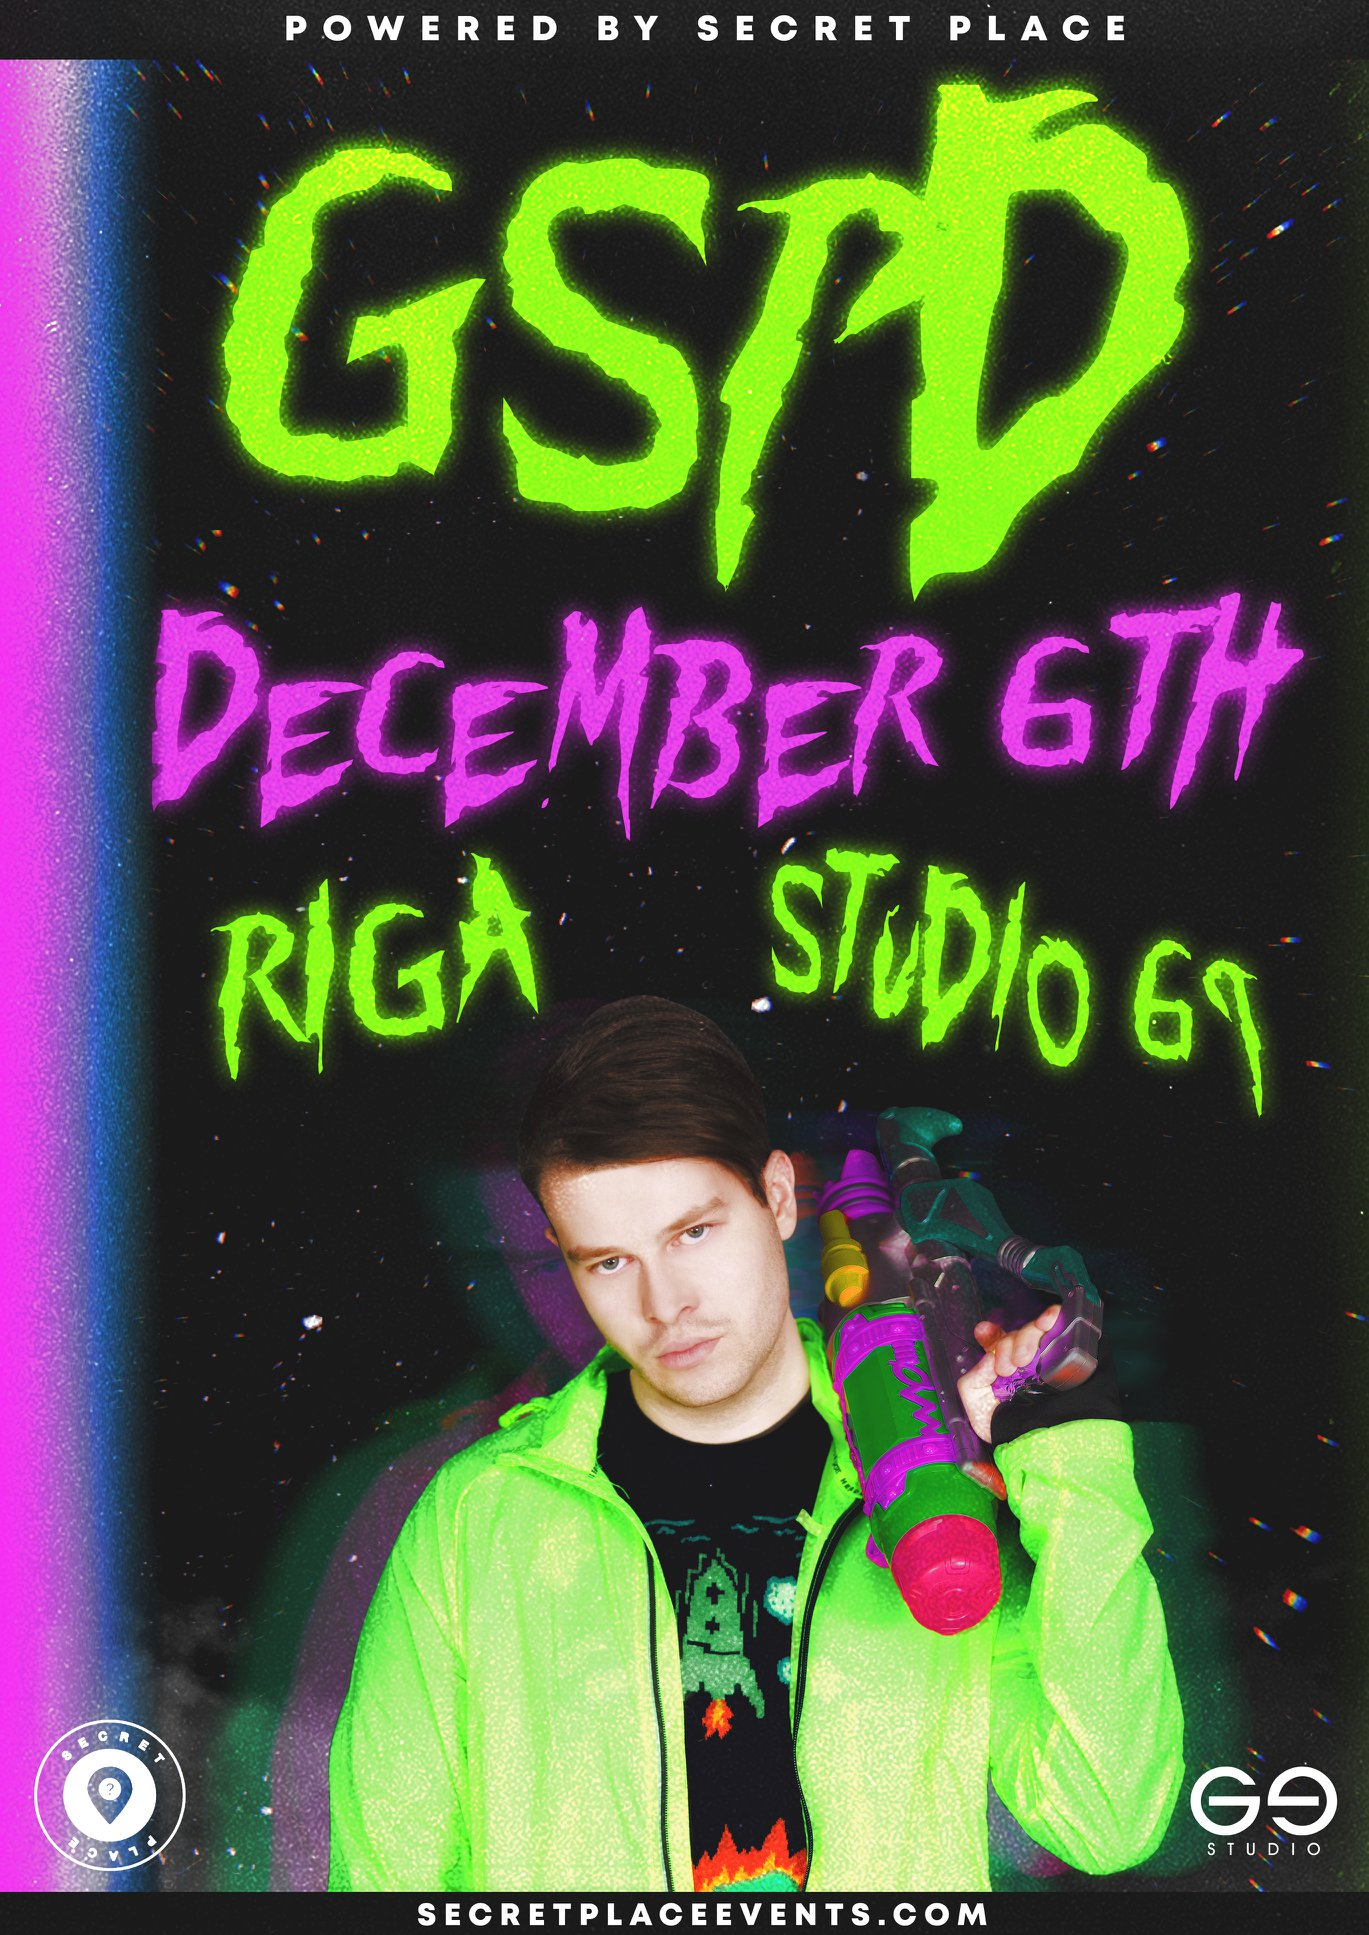 GSPD | 06.12 – Riga at Studio 69